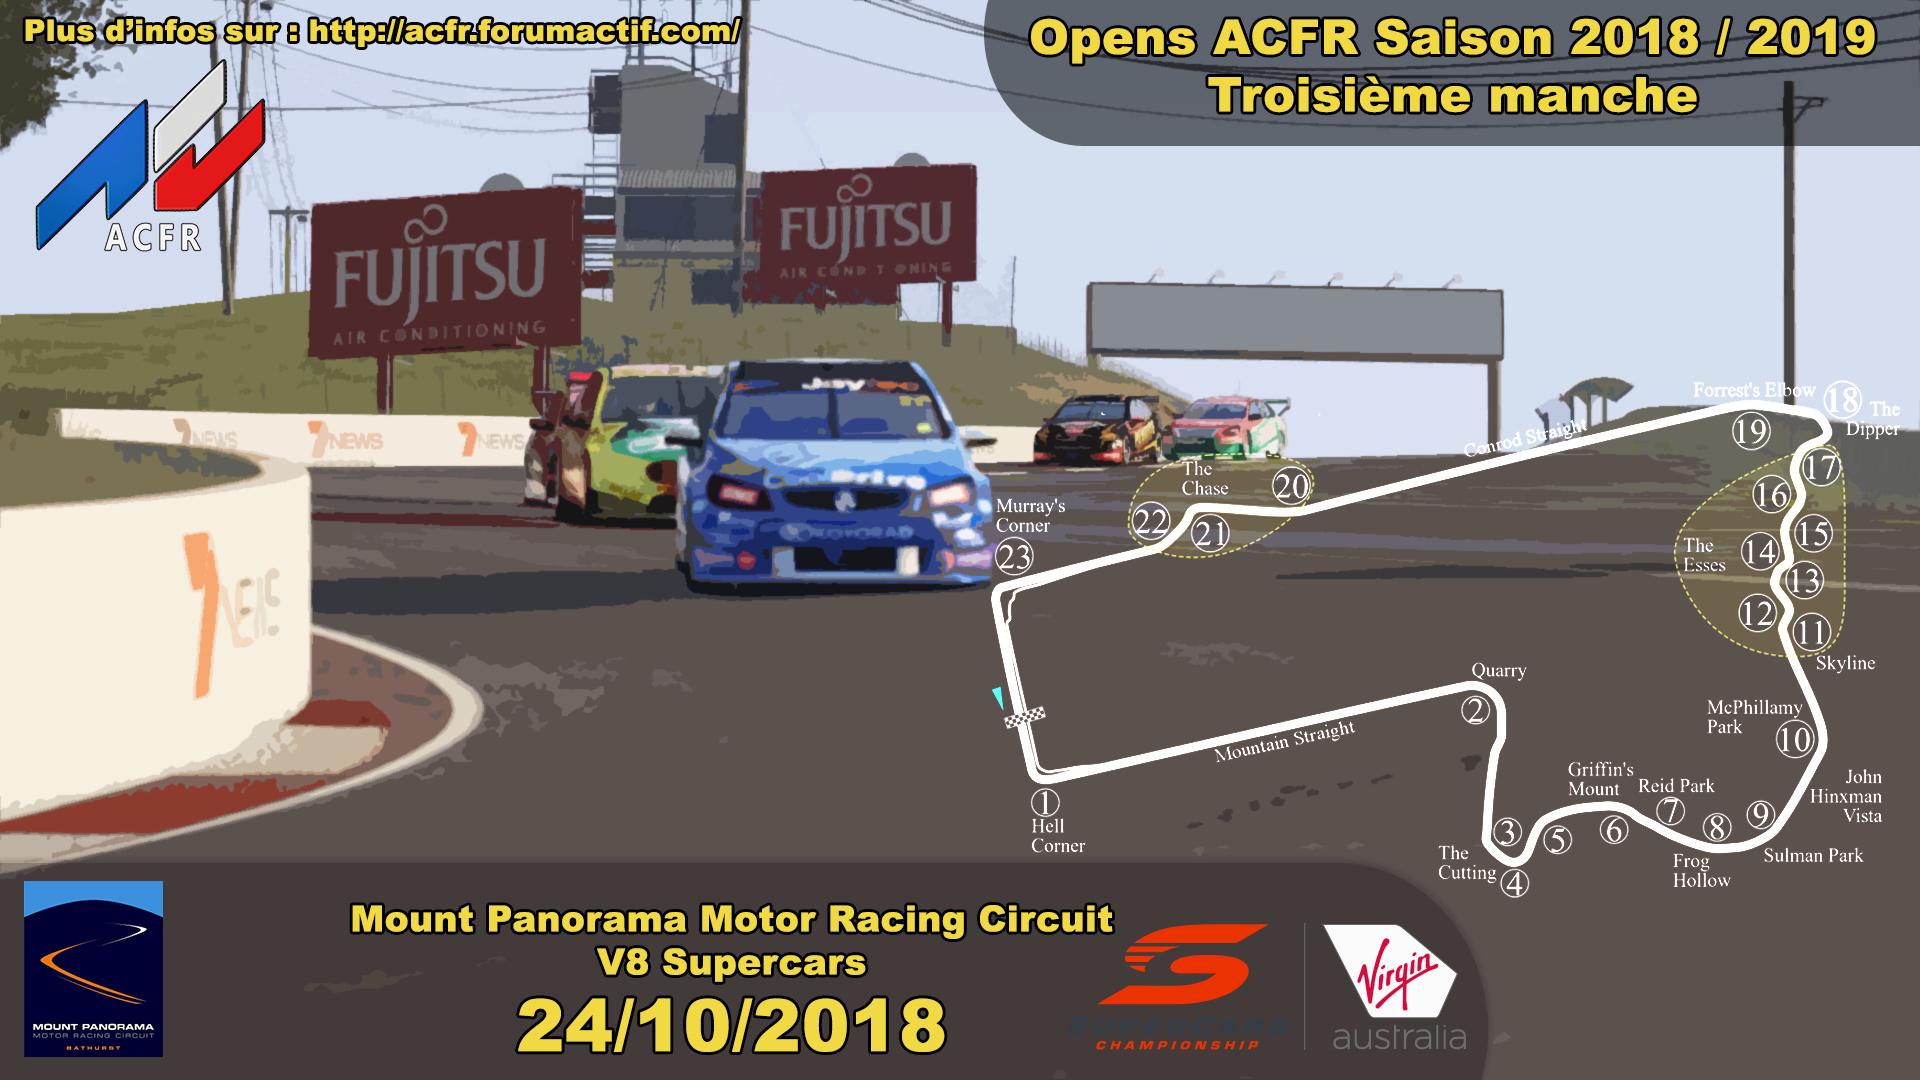 [Open ACFR] 24/10/2018 - Manche 3 saison 2018/2019 - Bathurst Mount Panorama - V8 Supercars Open_310